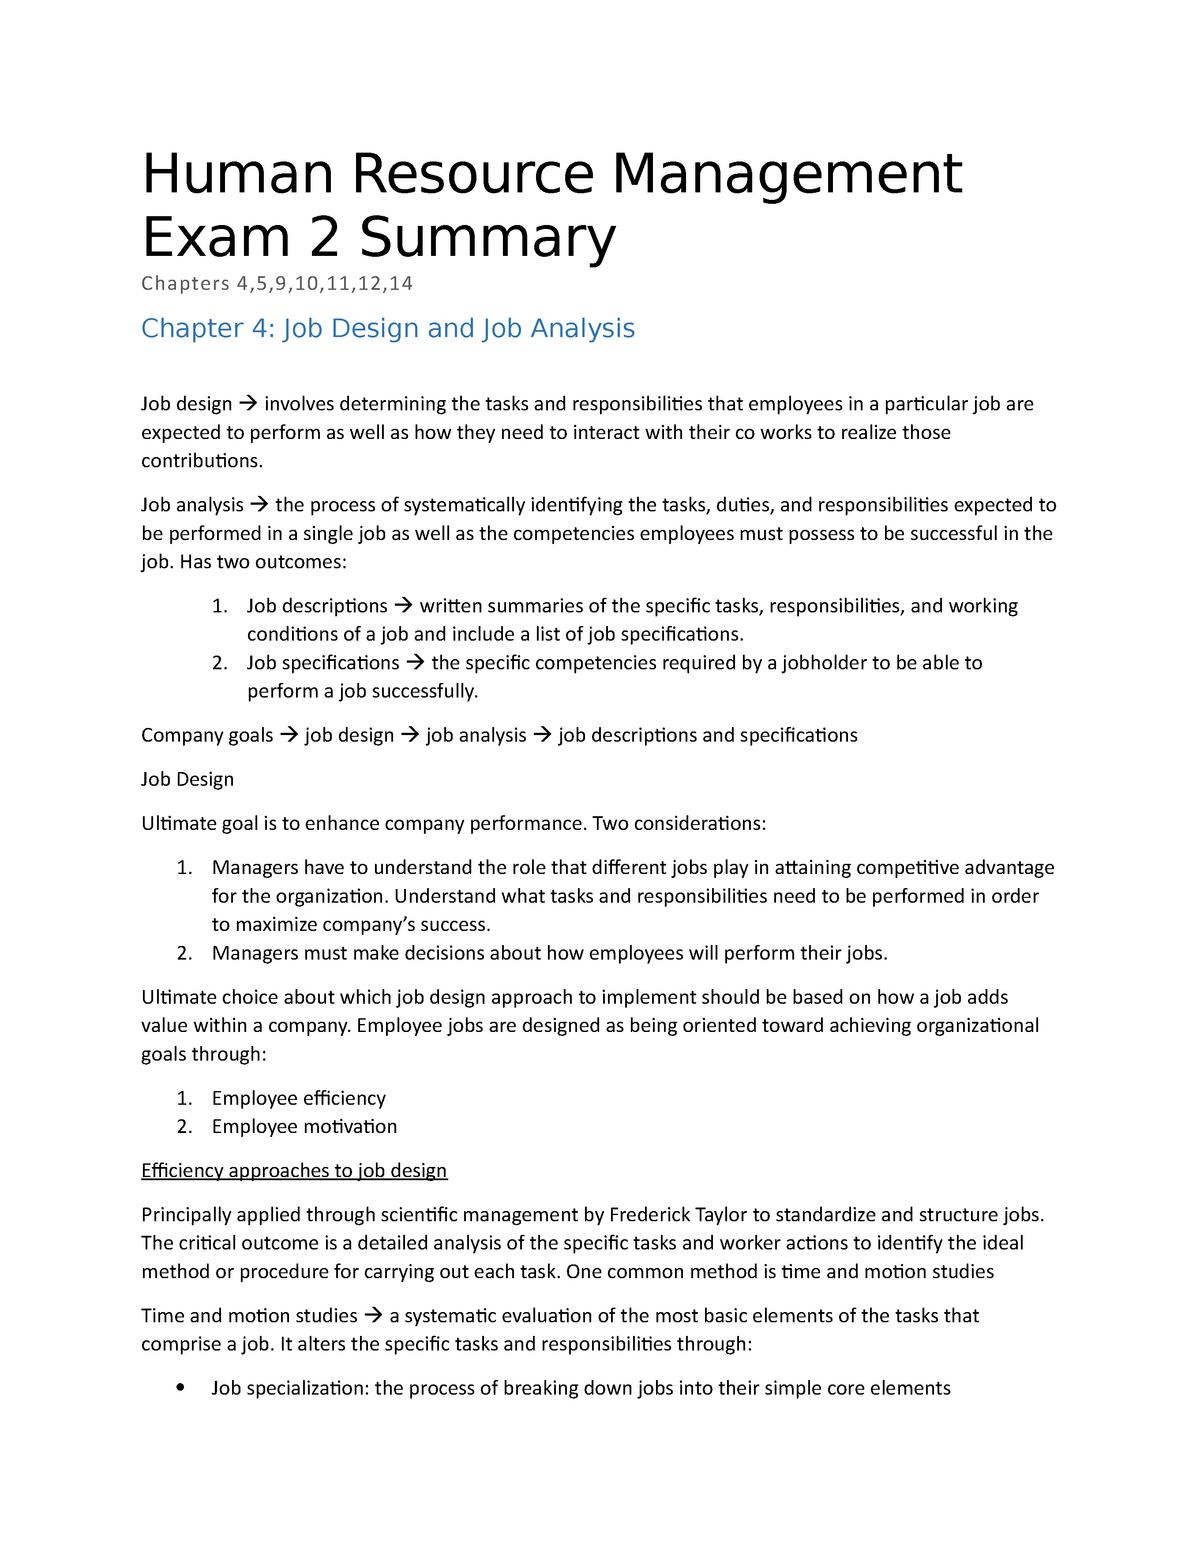 Human Resource Management Exam 2 Summary - 191841580 - StuDocu